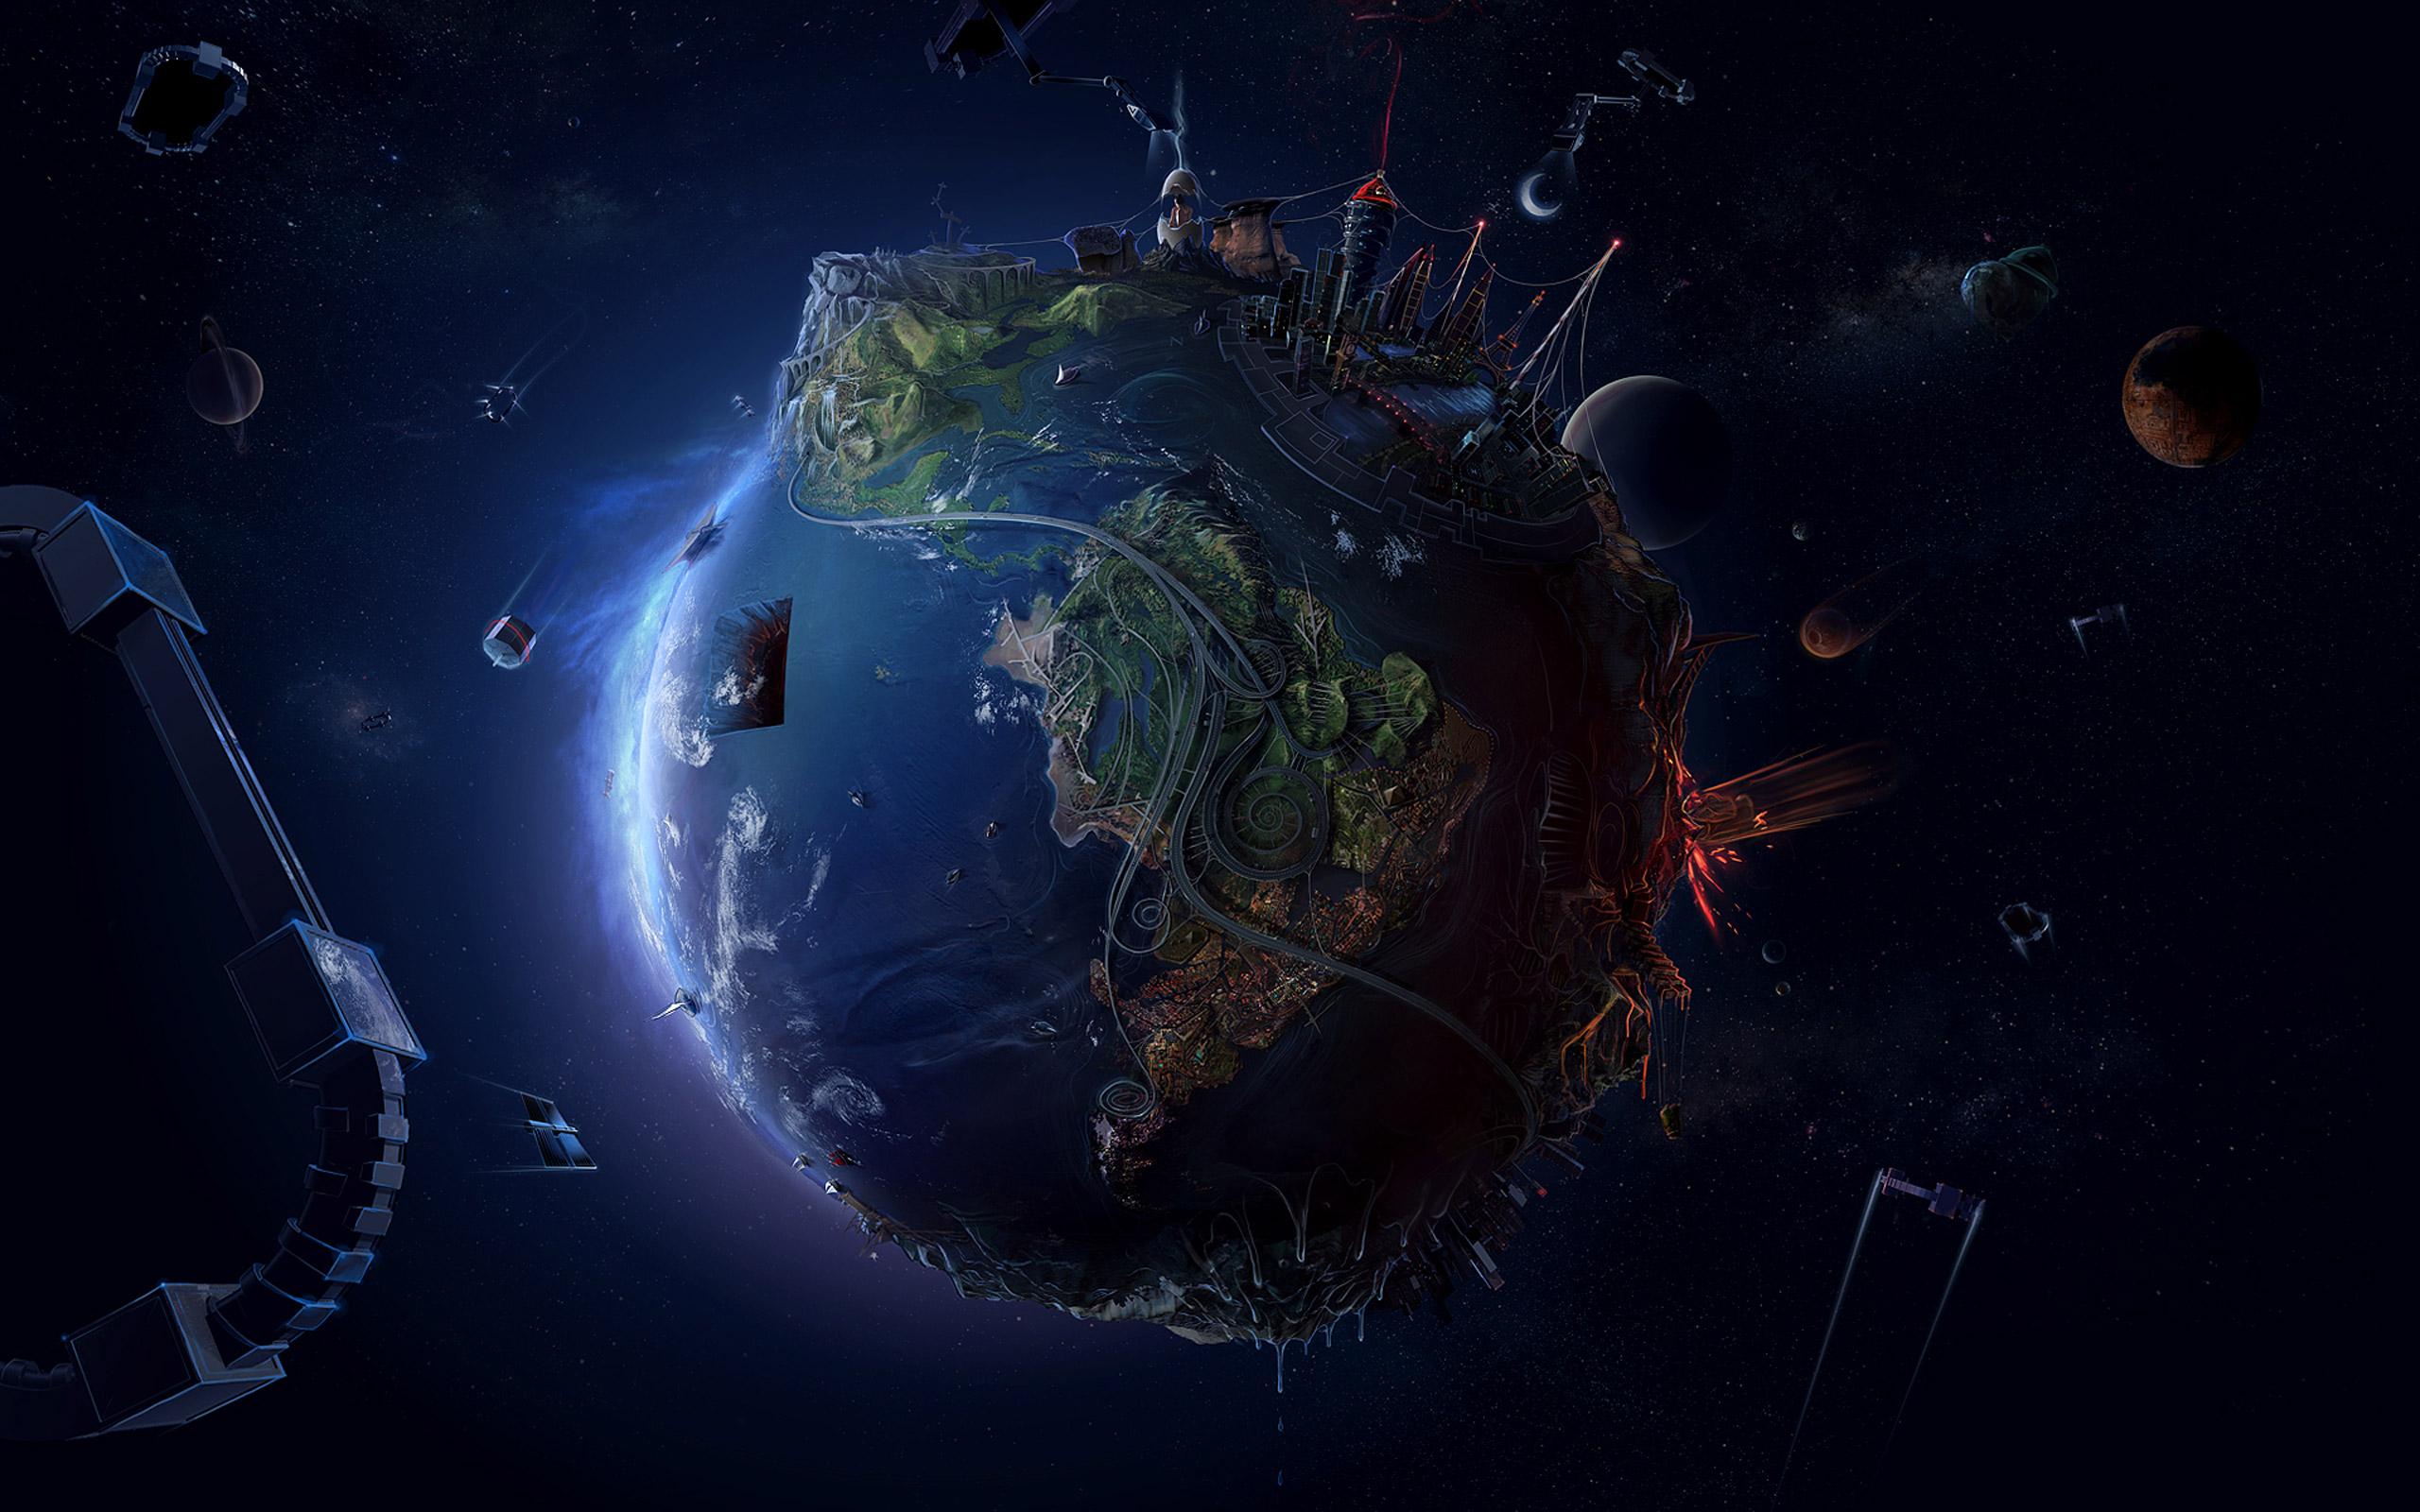 earth wallpaper 2560x1600